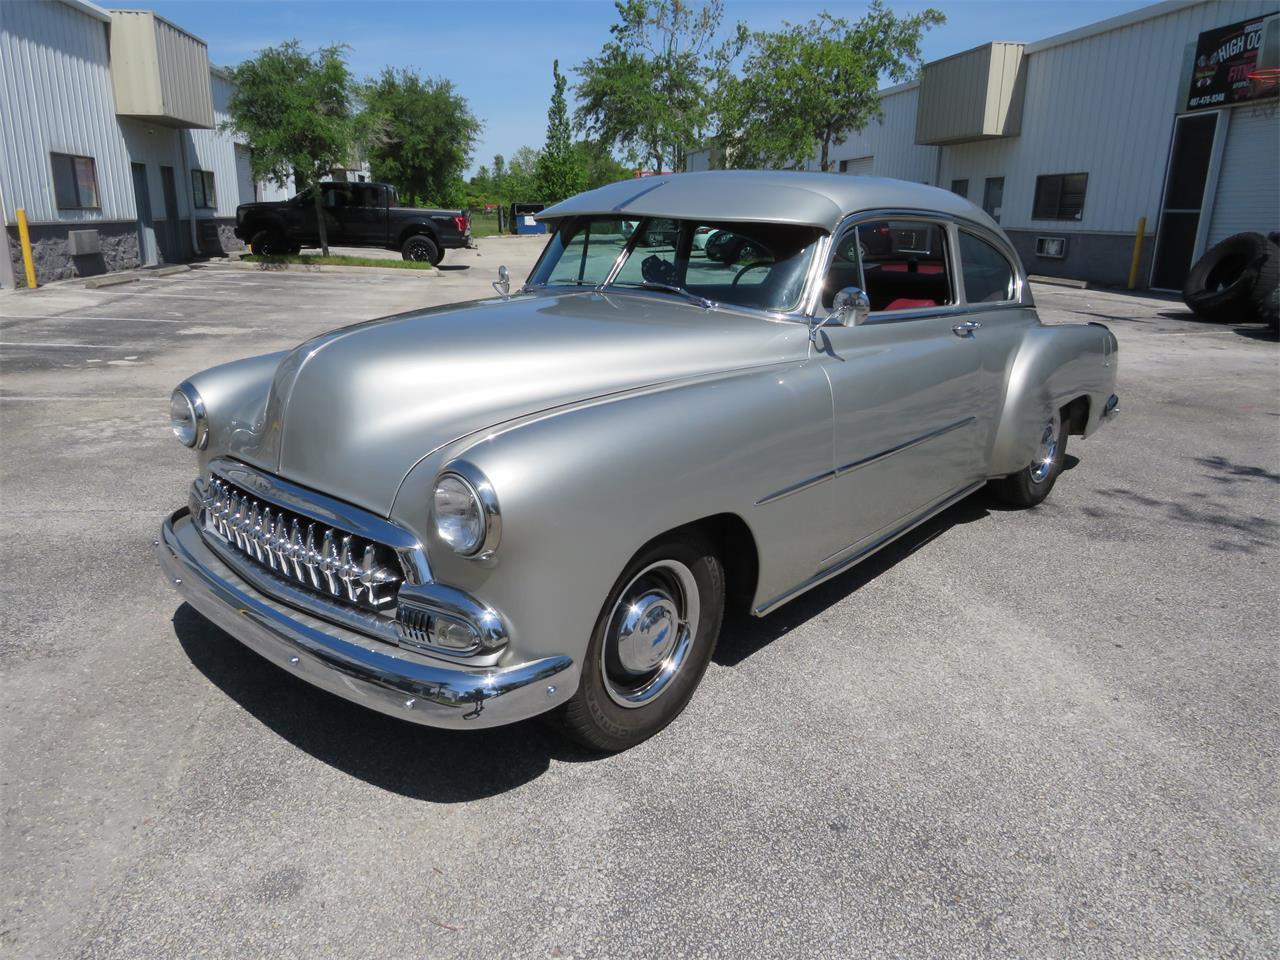 1951 Chevrolet Fleetline (CC-1340461) for sale in Apopka, FL - Florida